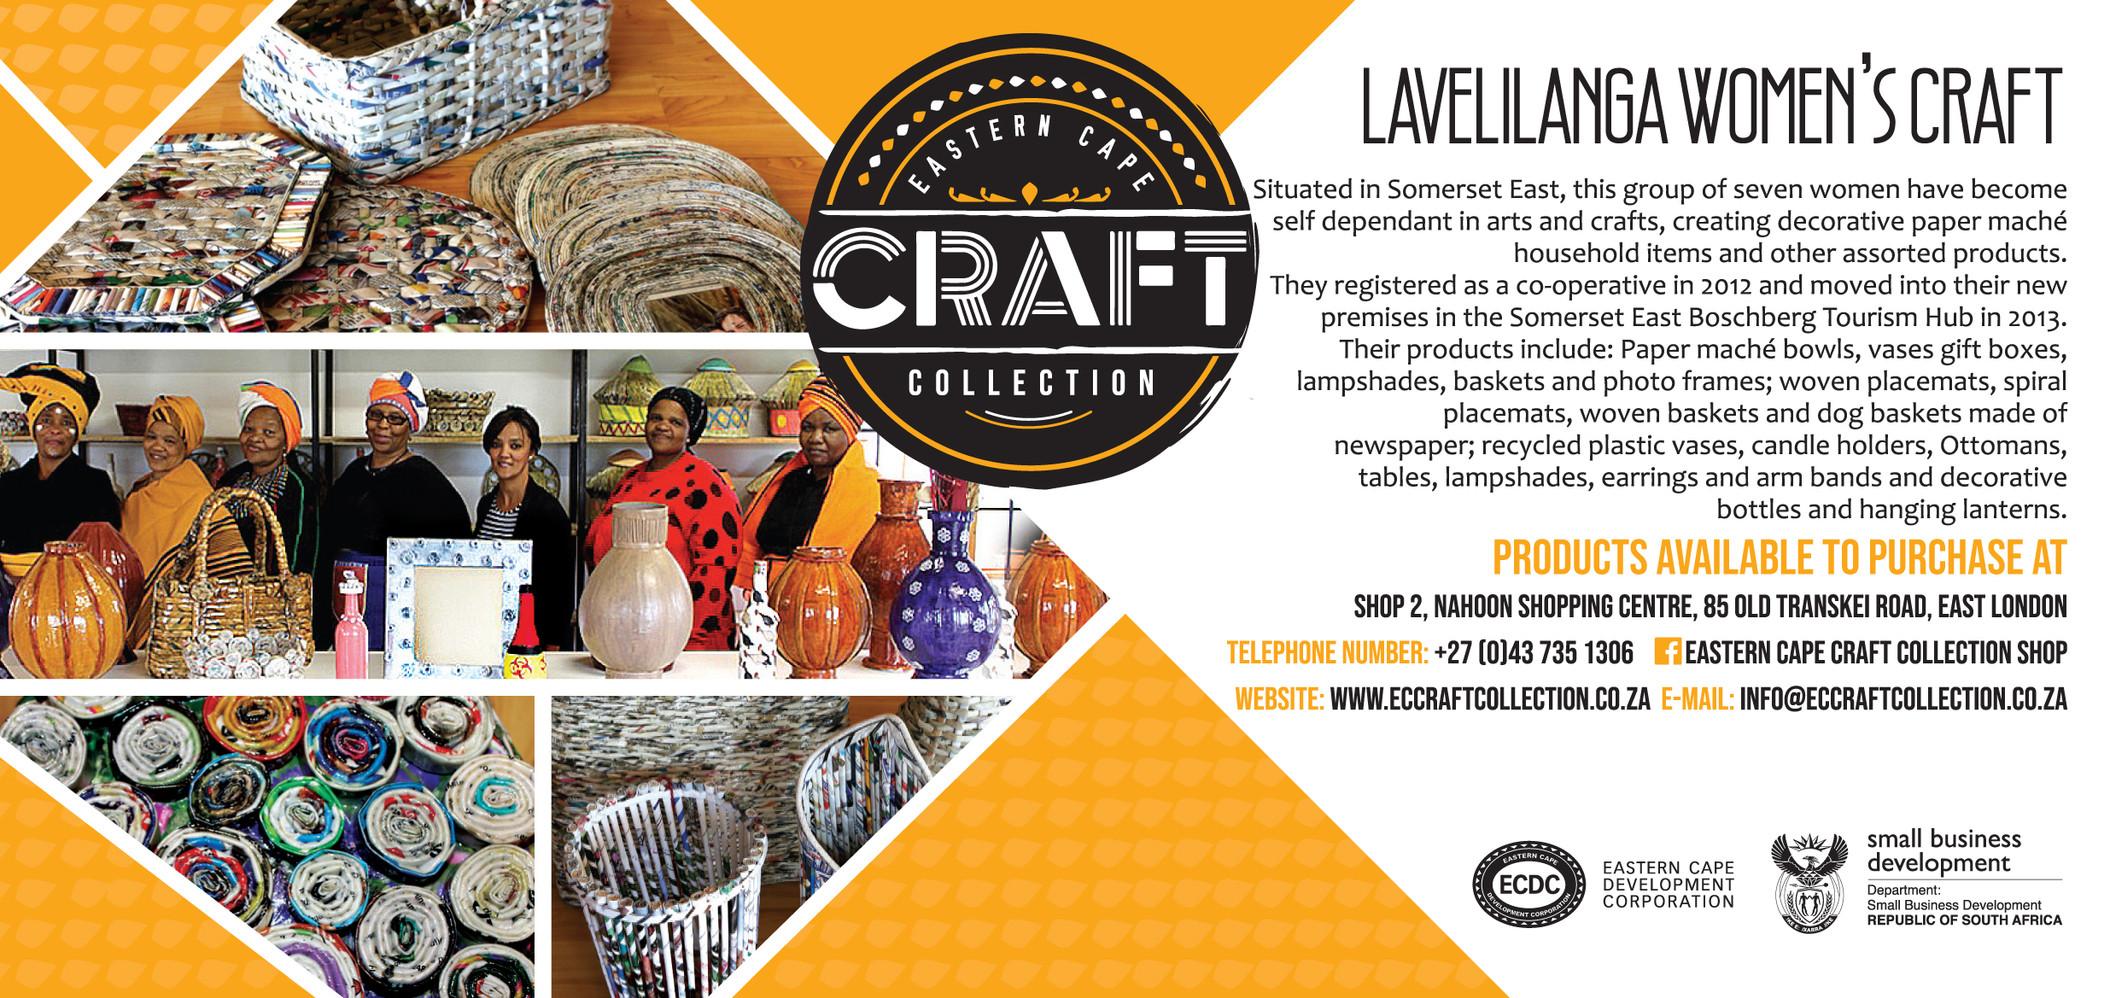 Lavelilanga Women's Craft